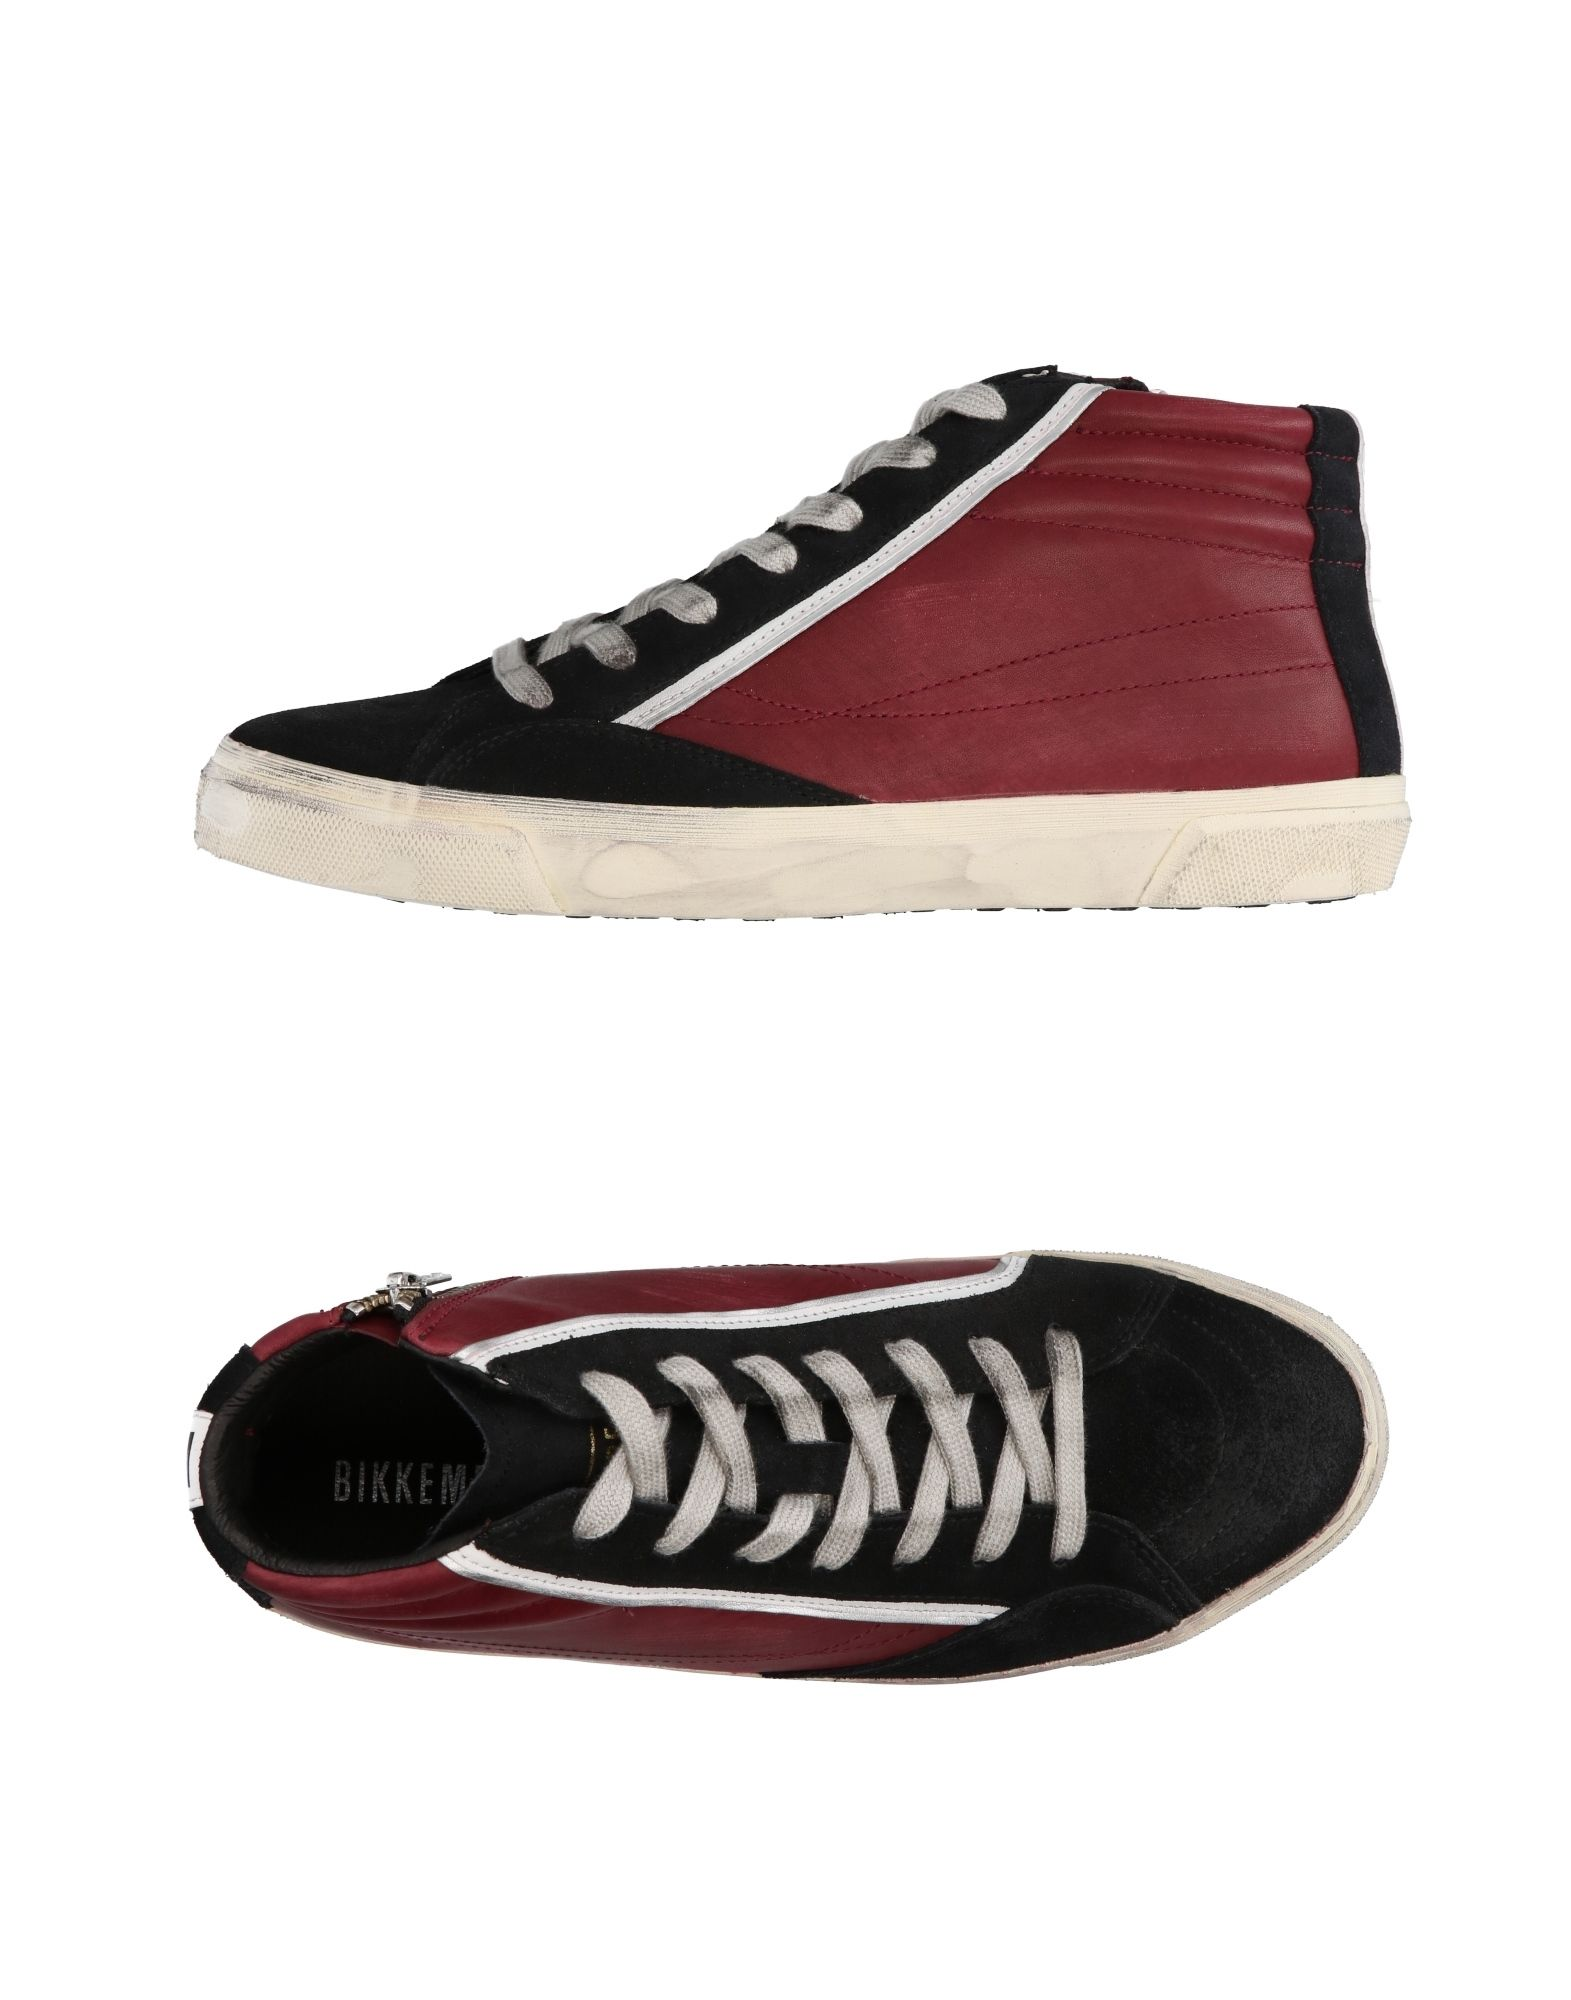 Bikkembergs Sneakers Sneakers Bikkembergs Herren  11284489FA 4568f2